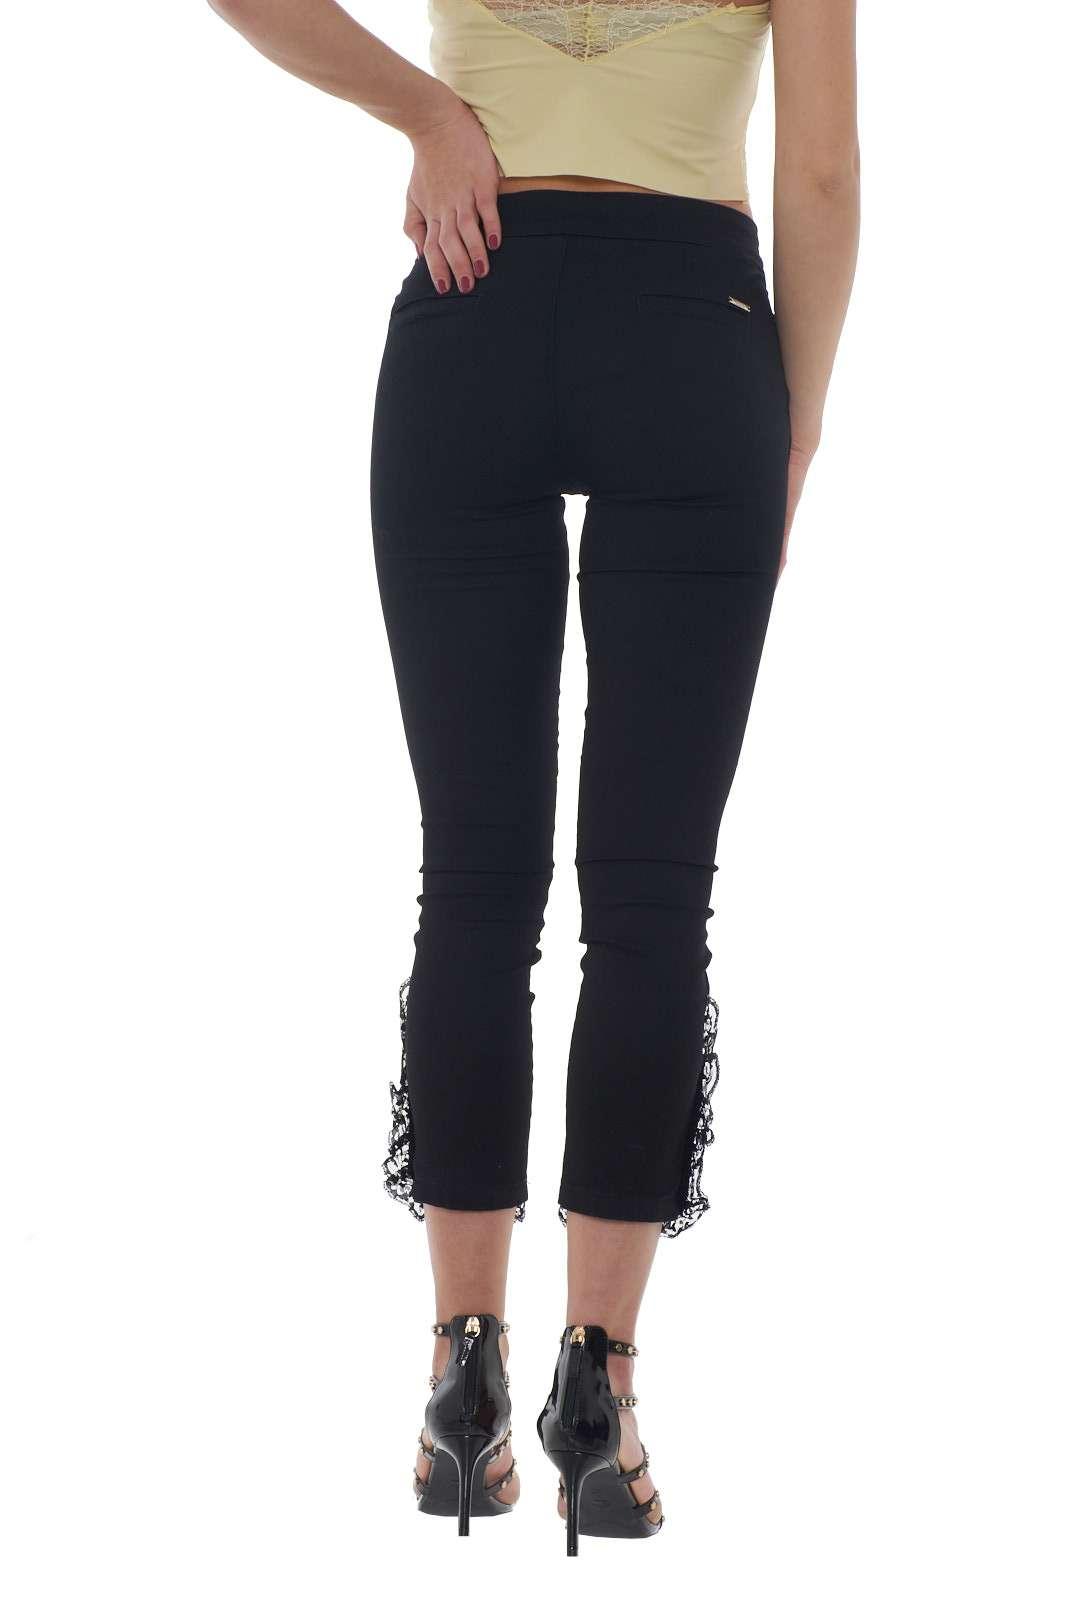 https://www.parmax.com/media/catalog/product/a/i/PE-outlet_parmax-pantaloni-donna-Liu-Jo-U18076-C.jpg